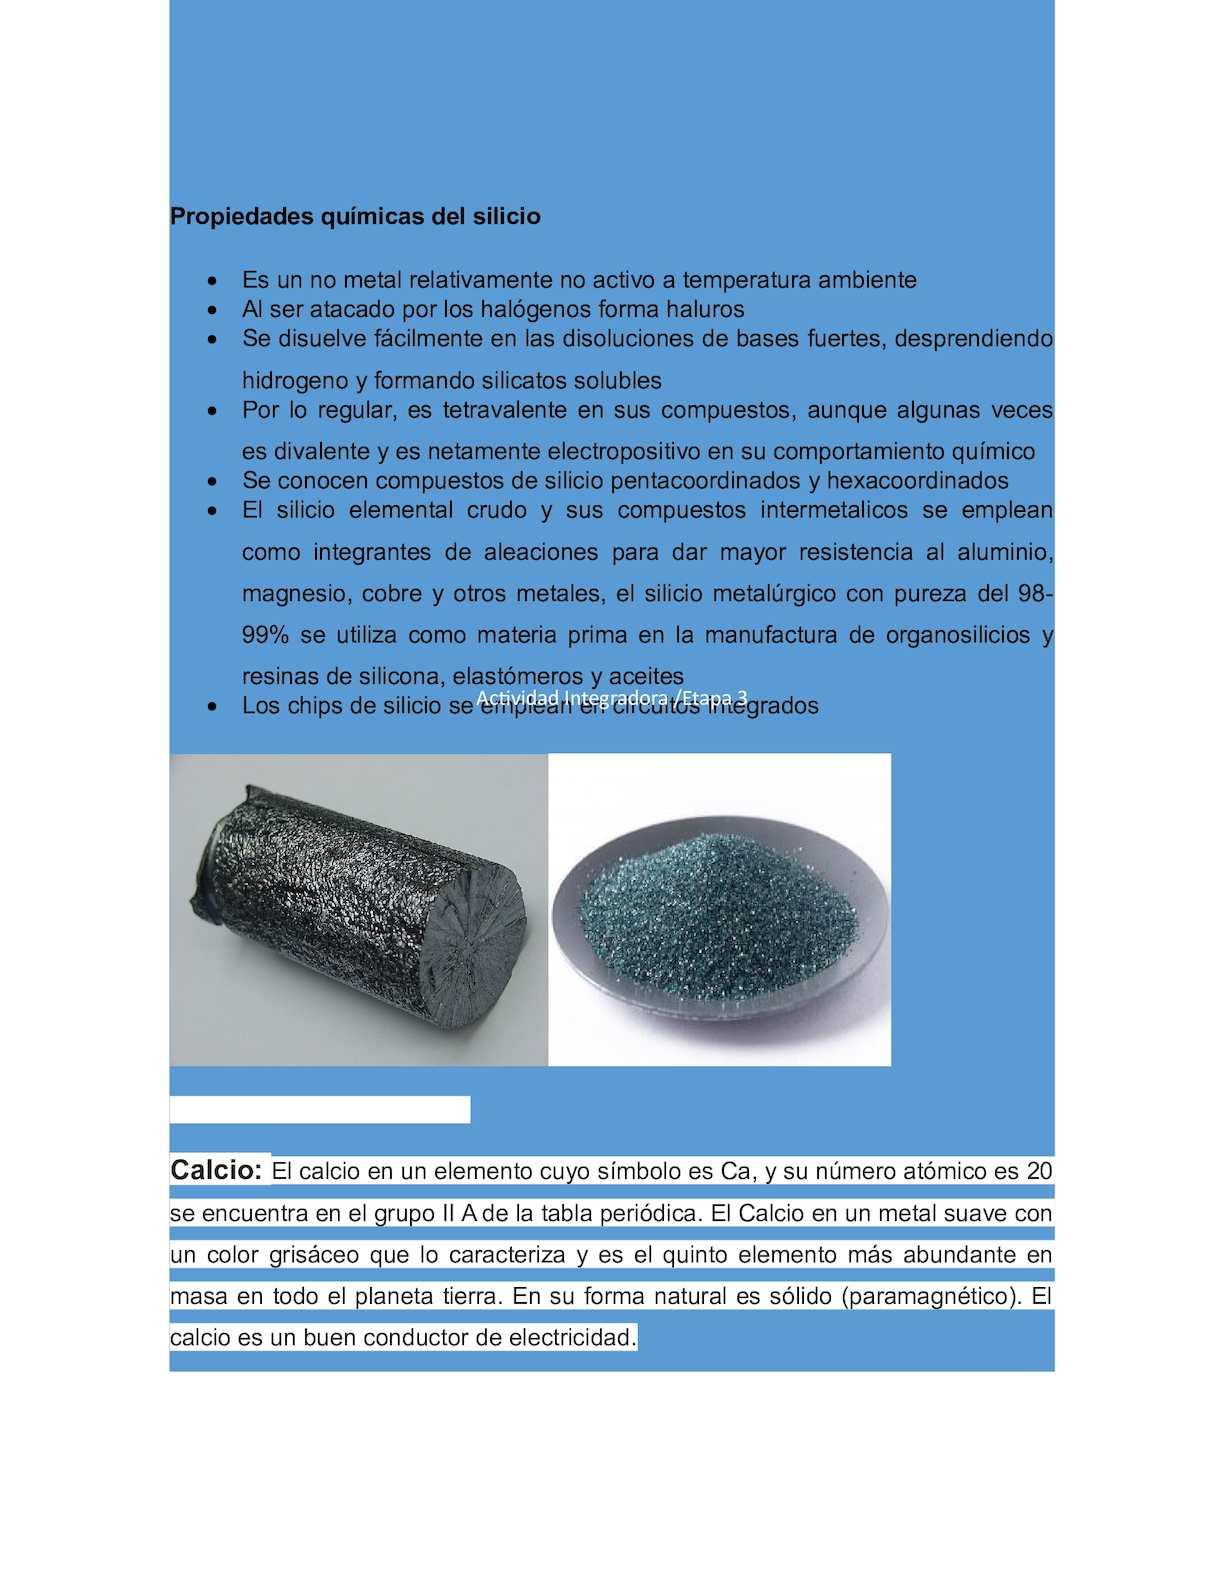 Quimica integradora 3 1 1 calameo downloader page 9 urtaz Choice Image